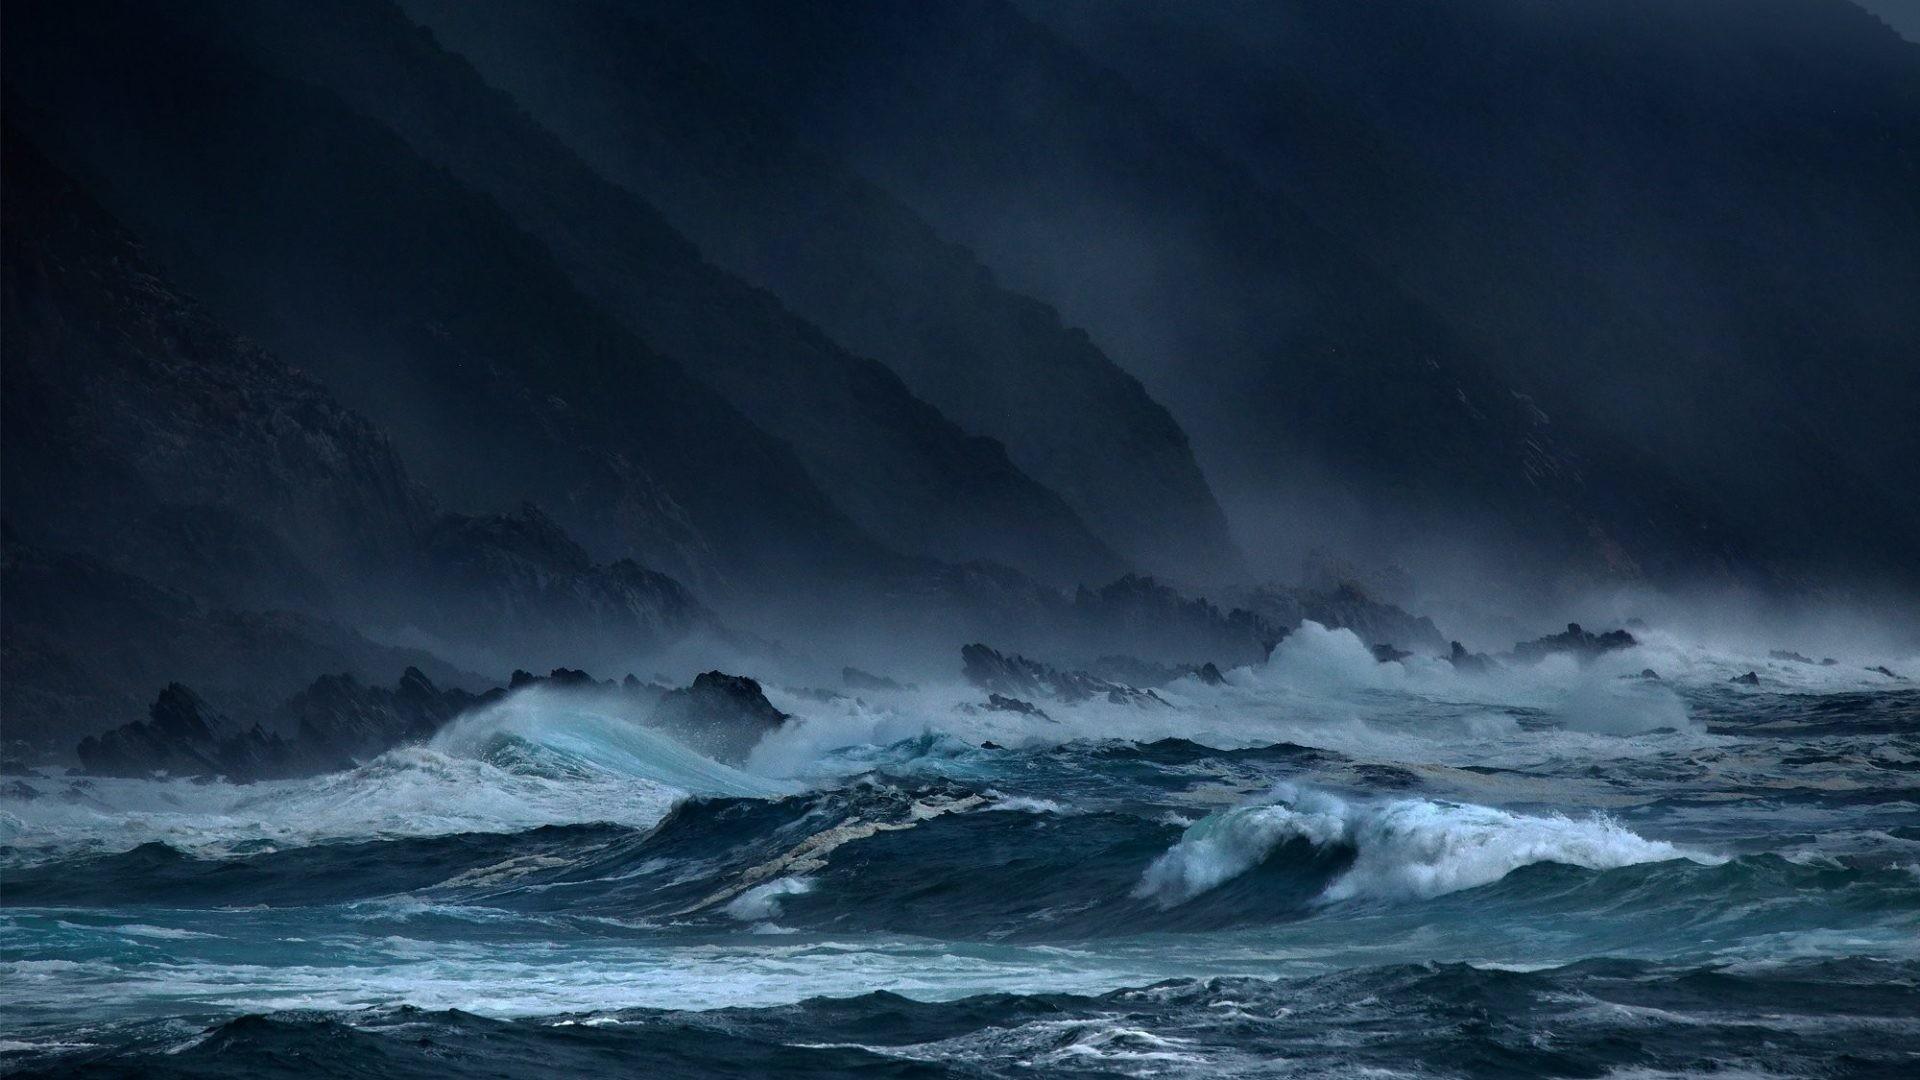 Sky Clouds Sea Rain Waves Ocean Weather Nature Storm Hd Download – 2000×1333